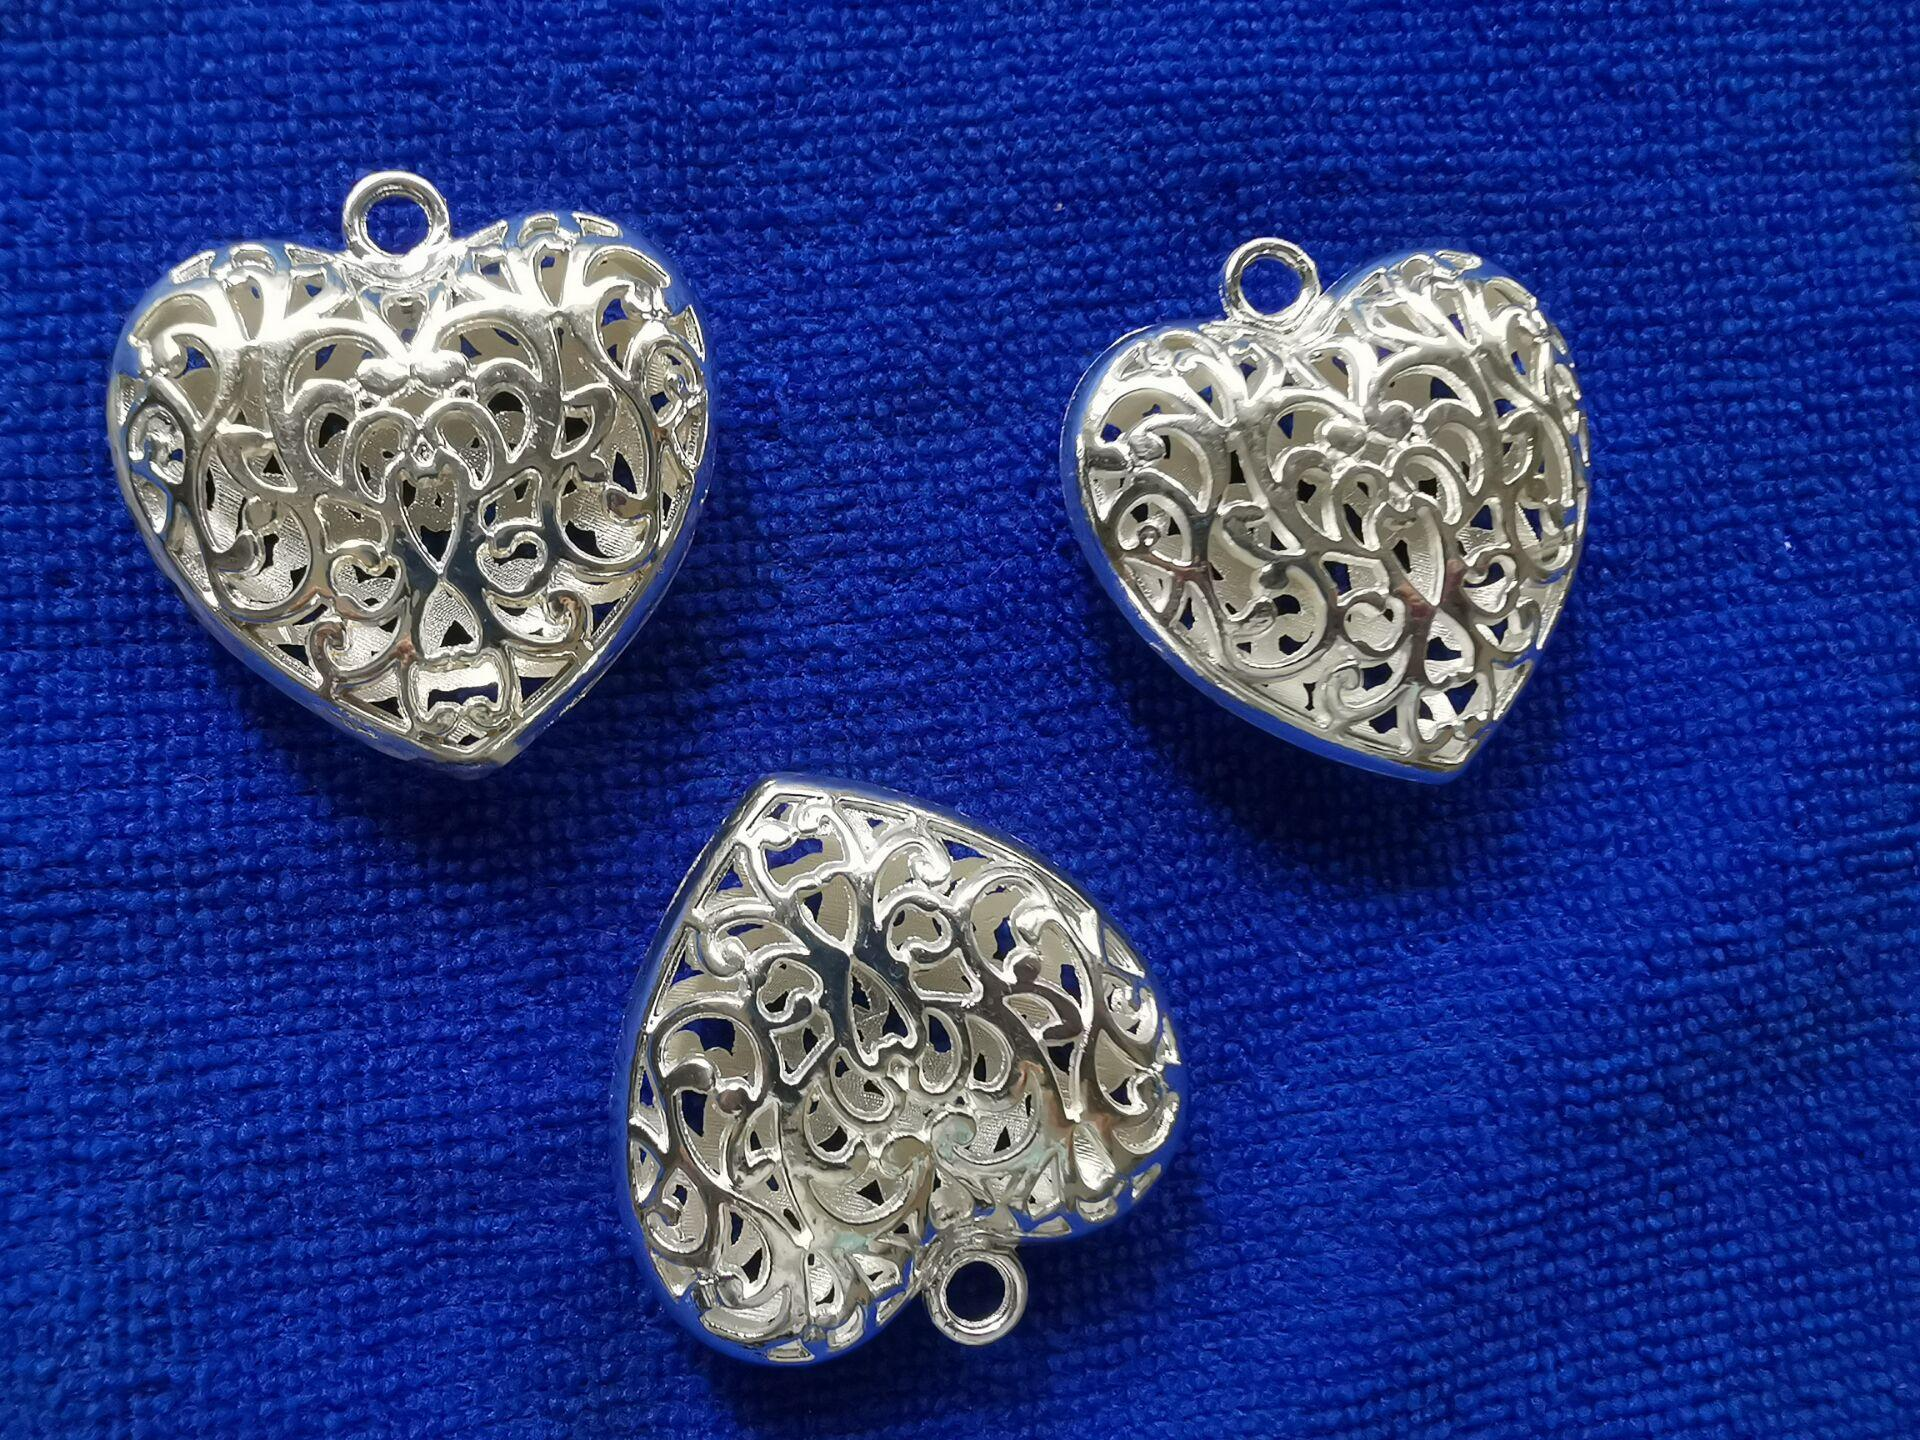 6st Sterling Silver Plate Metal 50mm Filigree Heart Charm Pendants A10472SSP